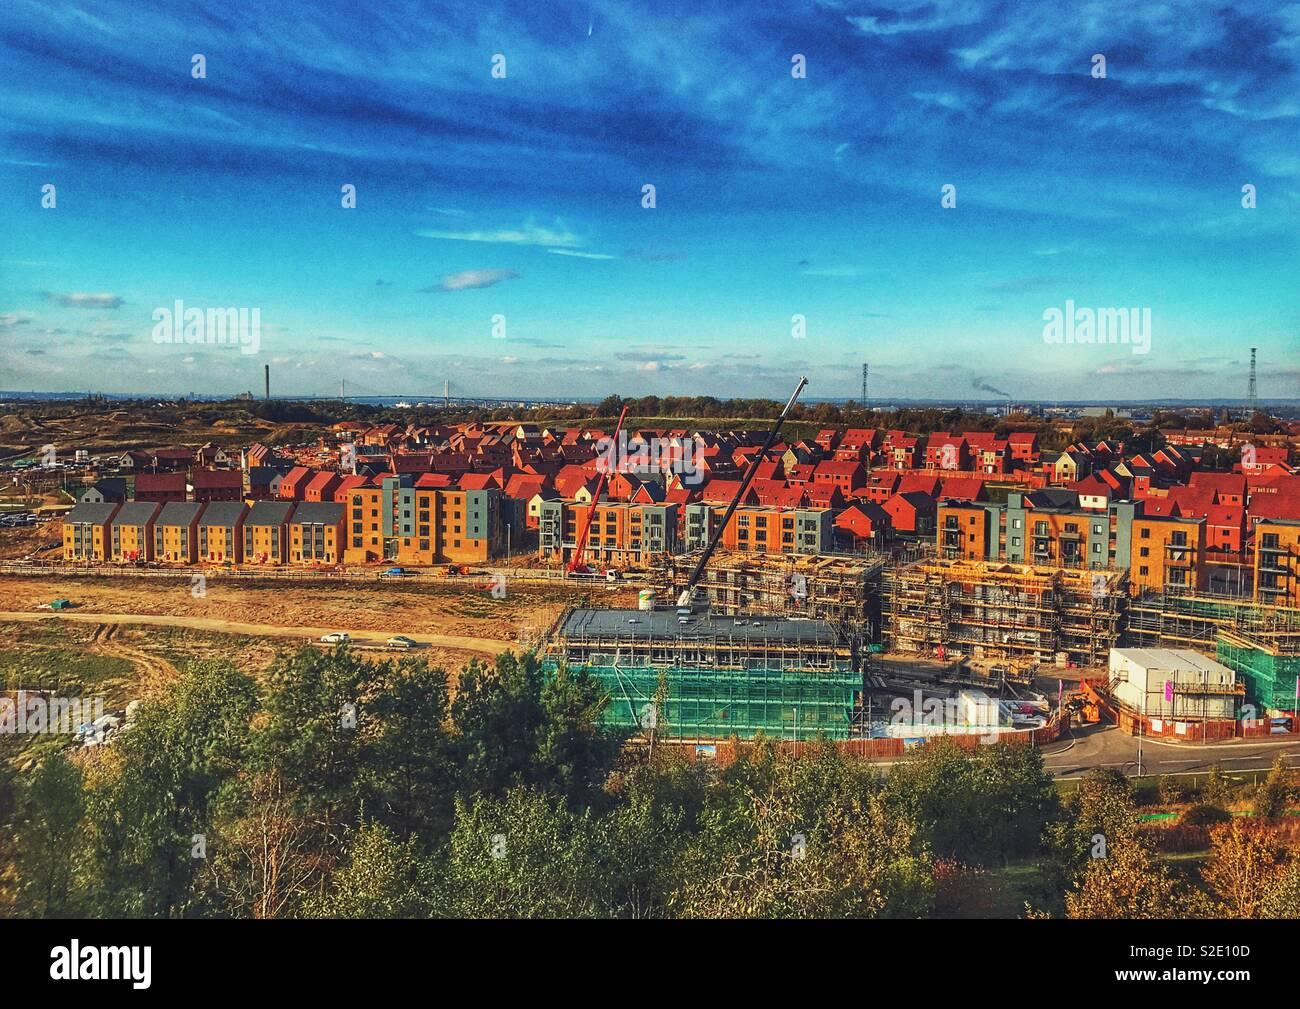 Wohnungsbau in großem Maßstab Stockbild